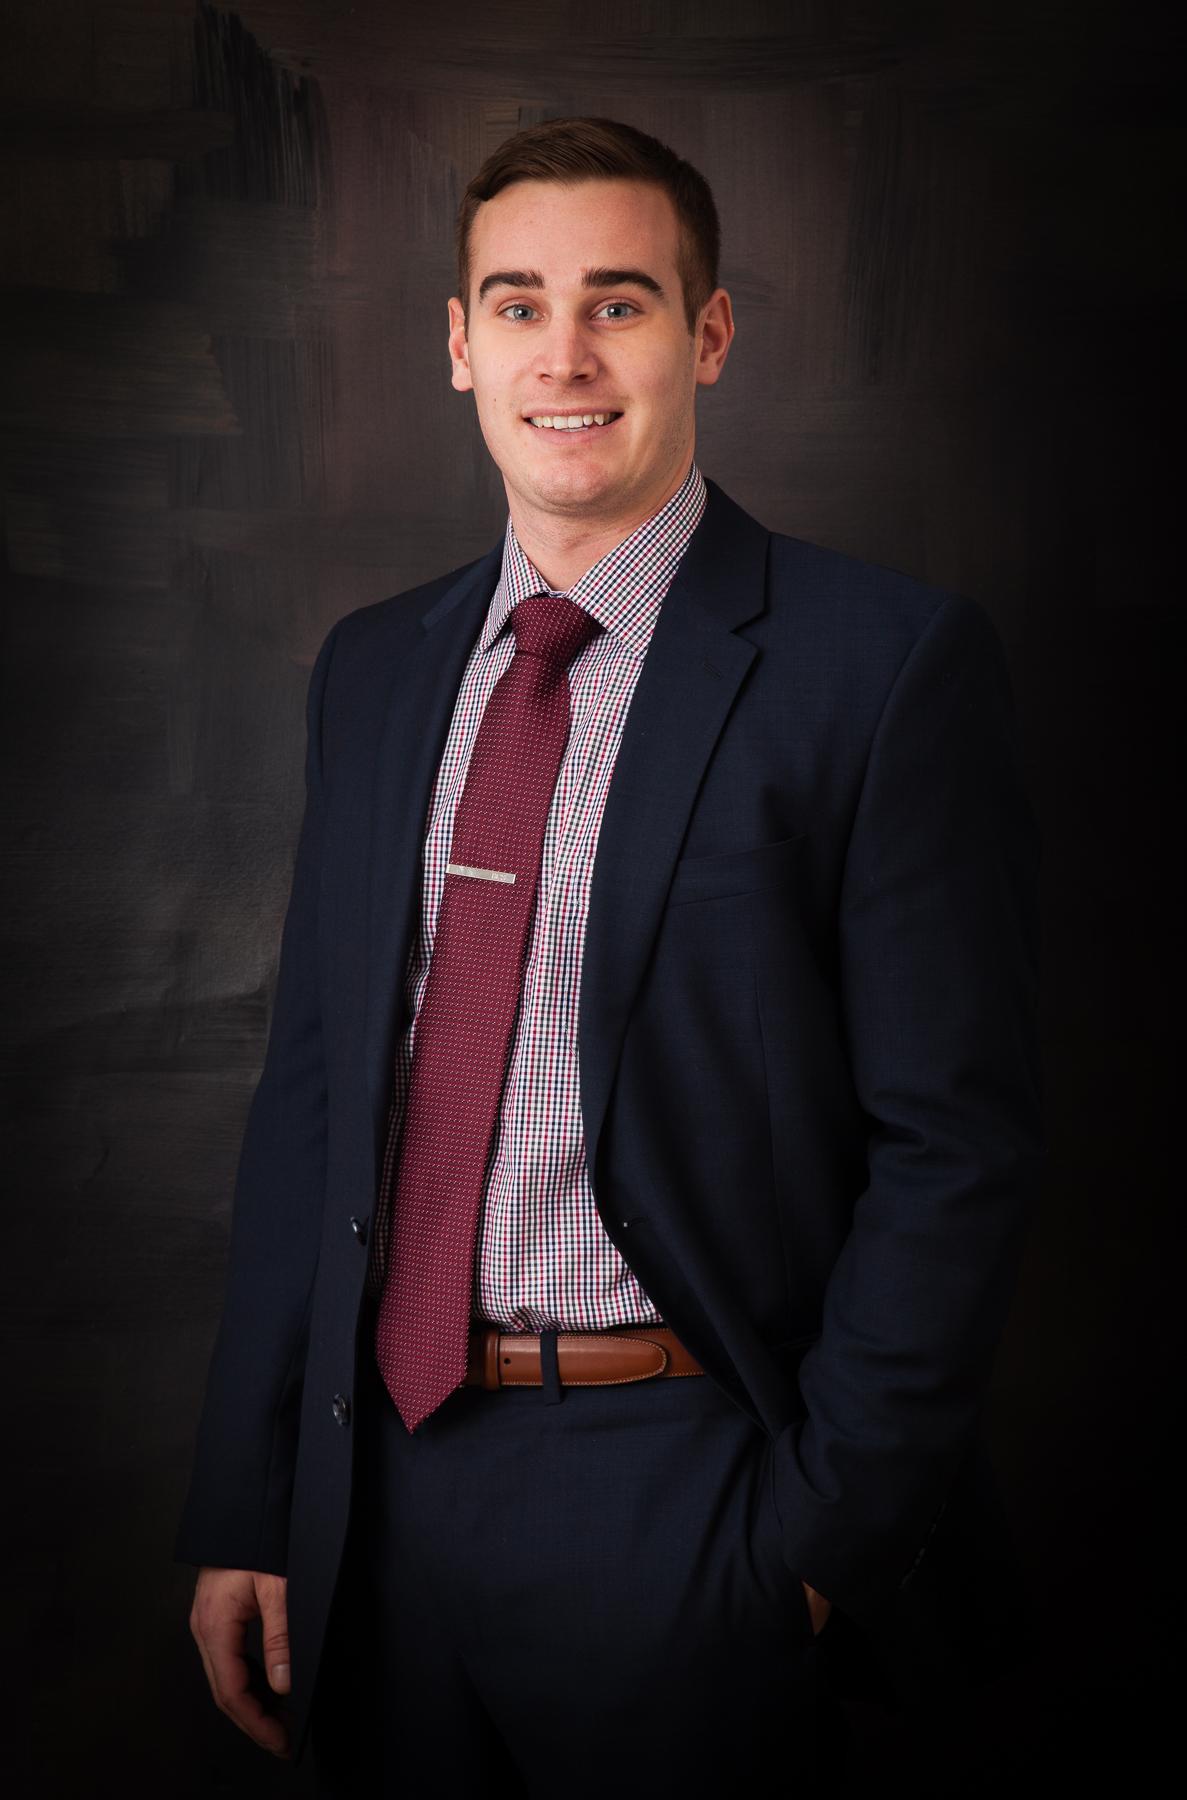 Brody Schoen, financial advisor Indianapolis IN